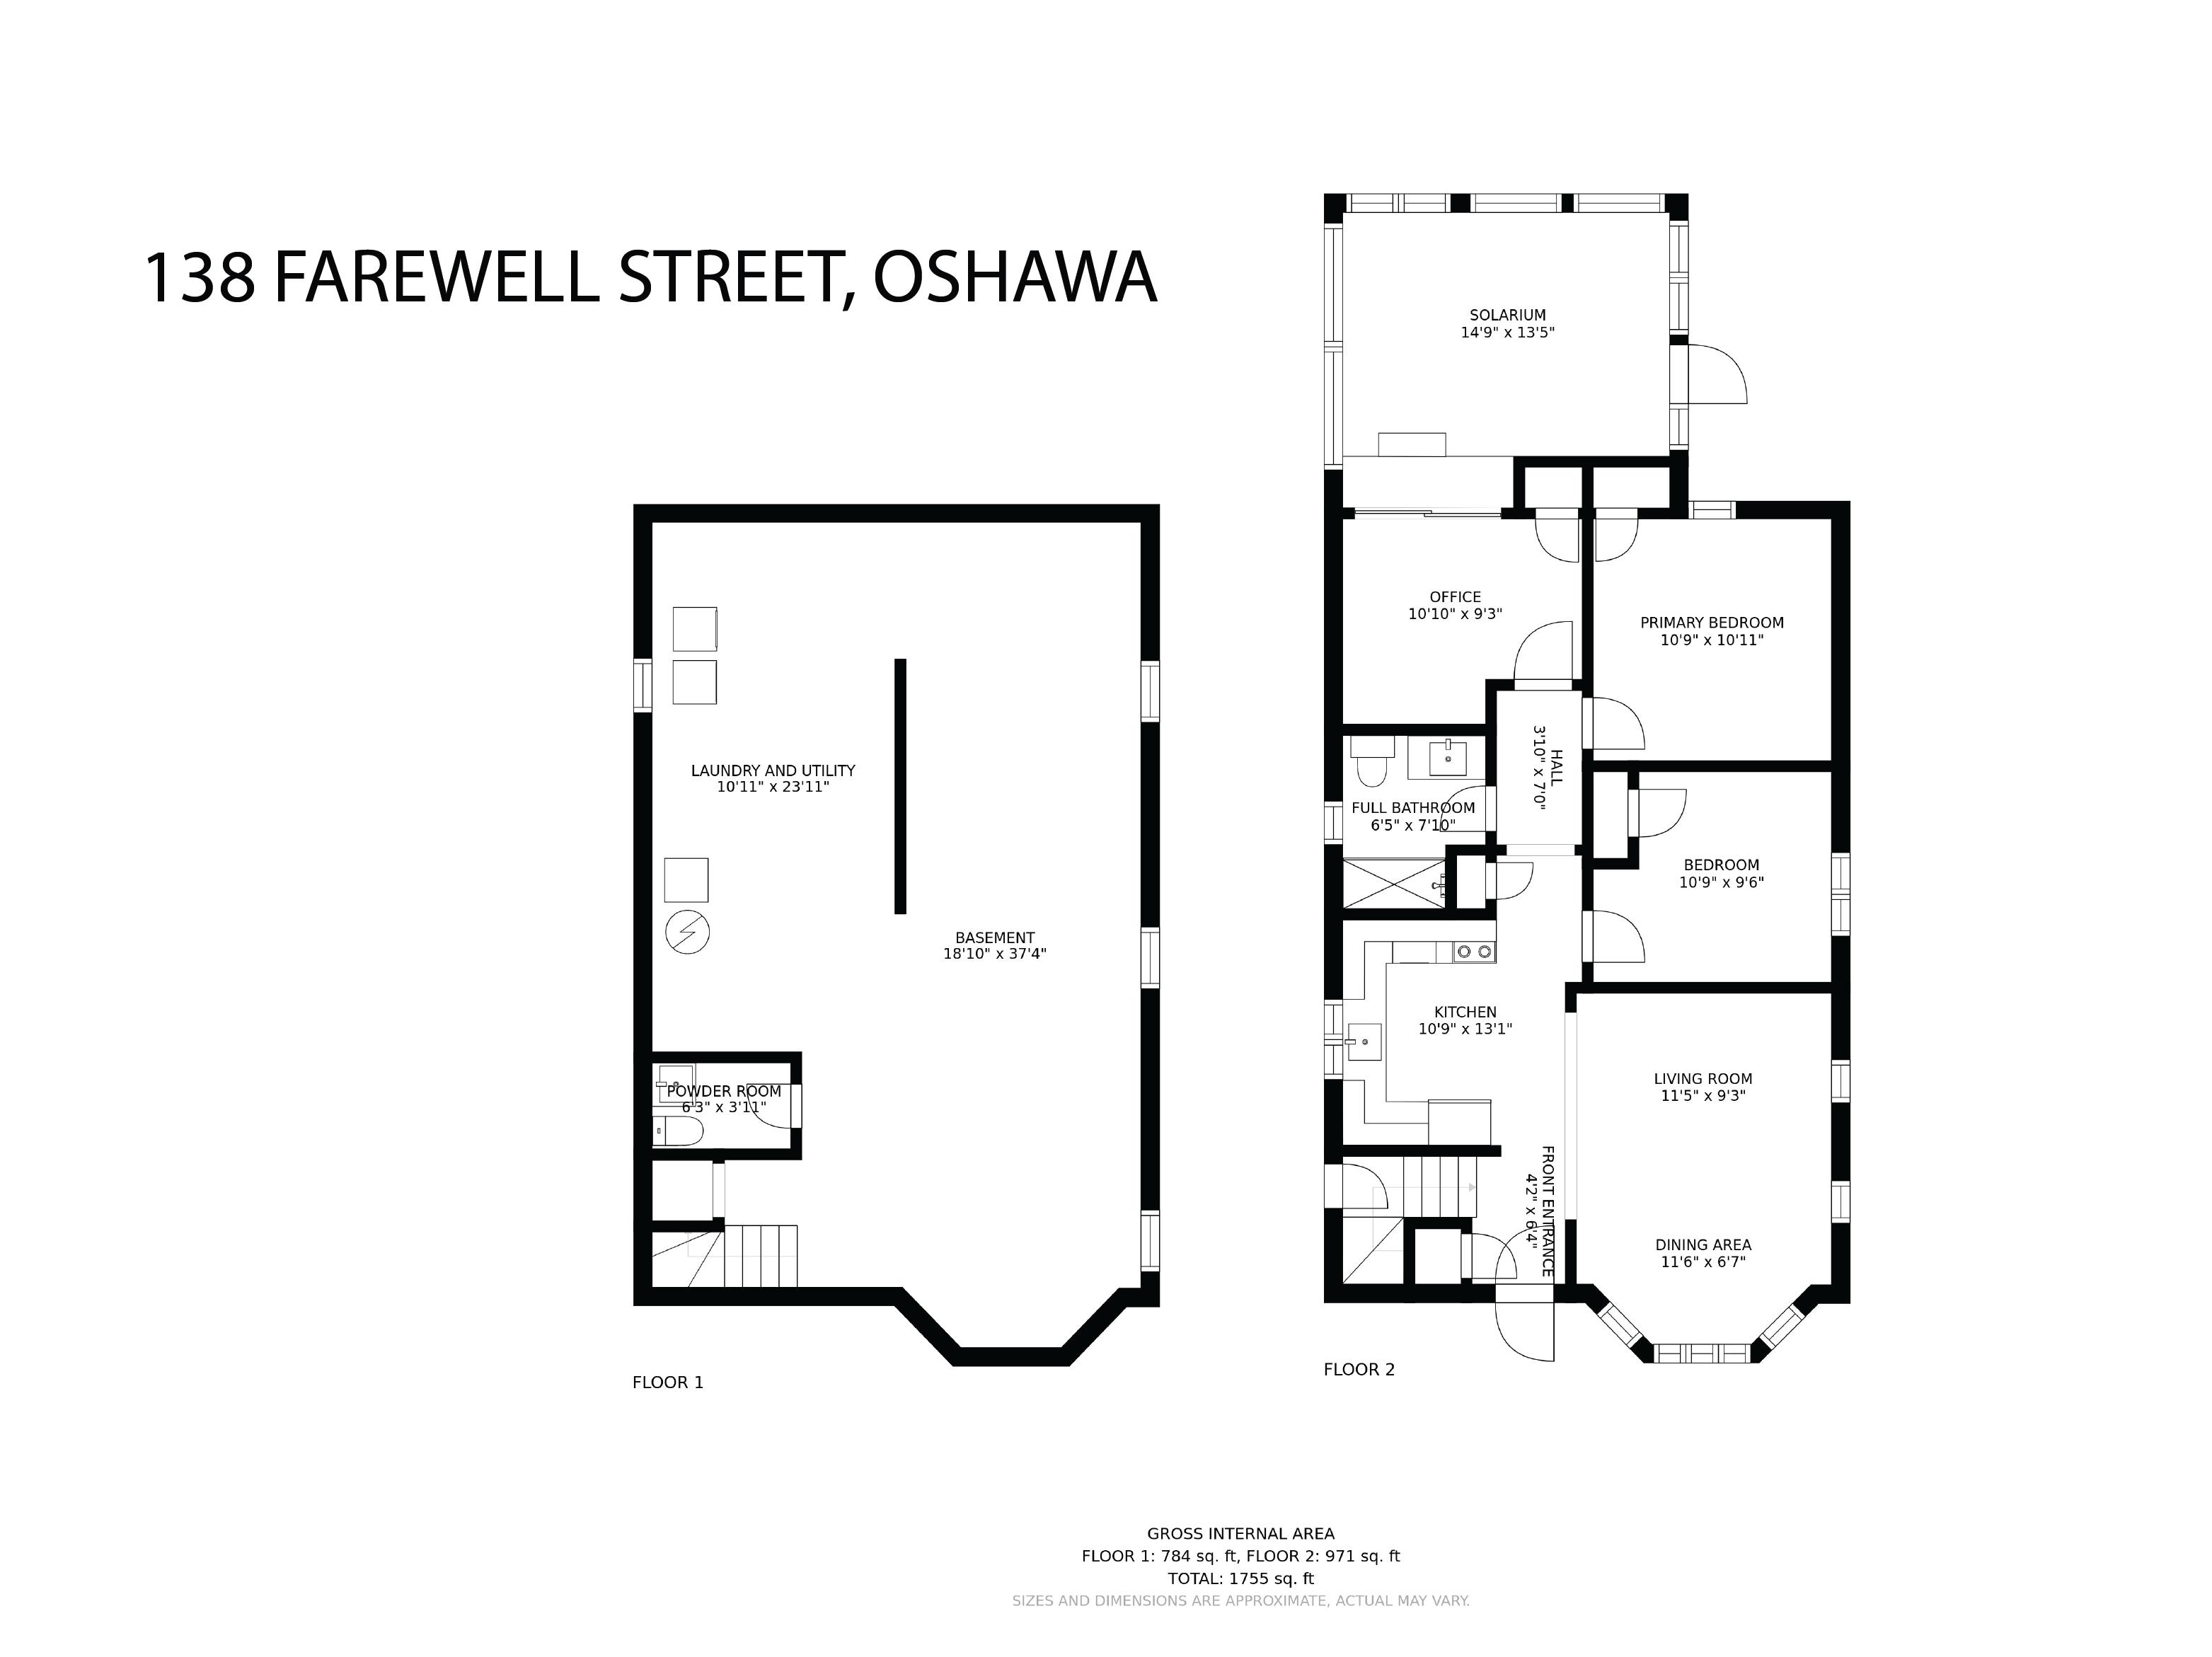 138 Farewell Street floorplan